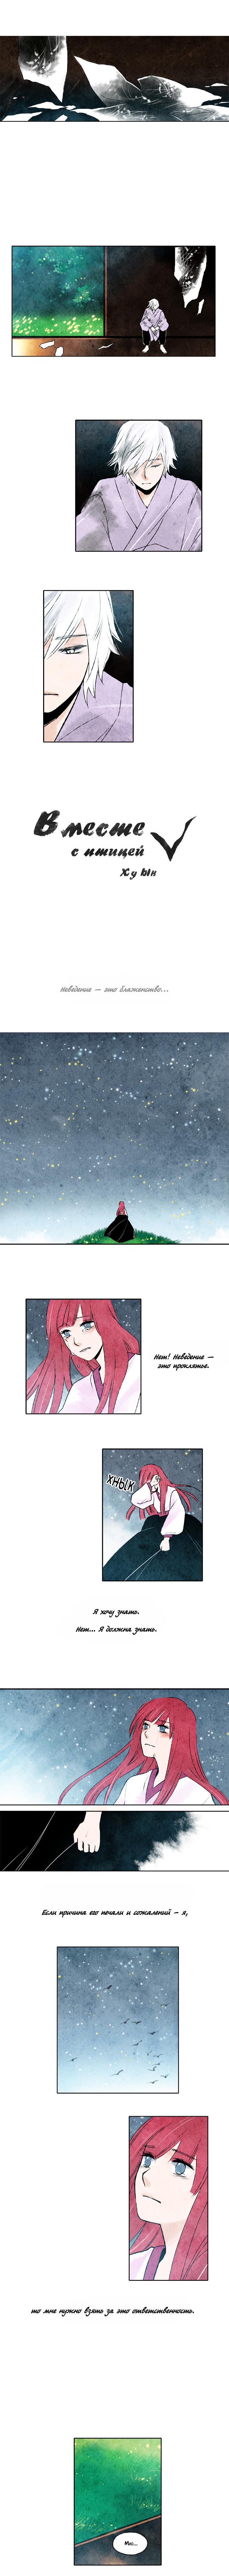 https://r1.ninemanga.com/comics/pic2/39/22503/1257054/1541334849772.jpg Page 1